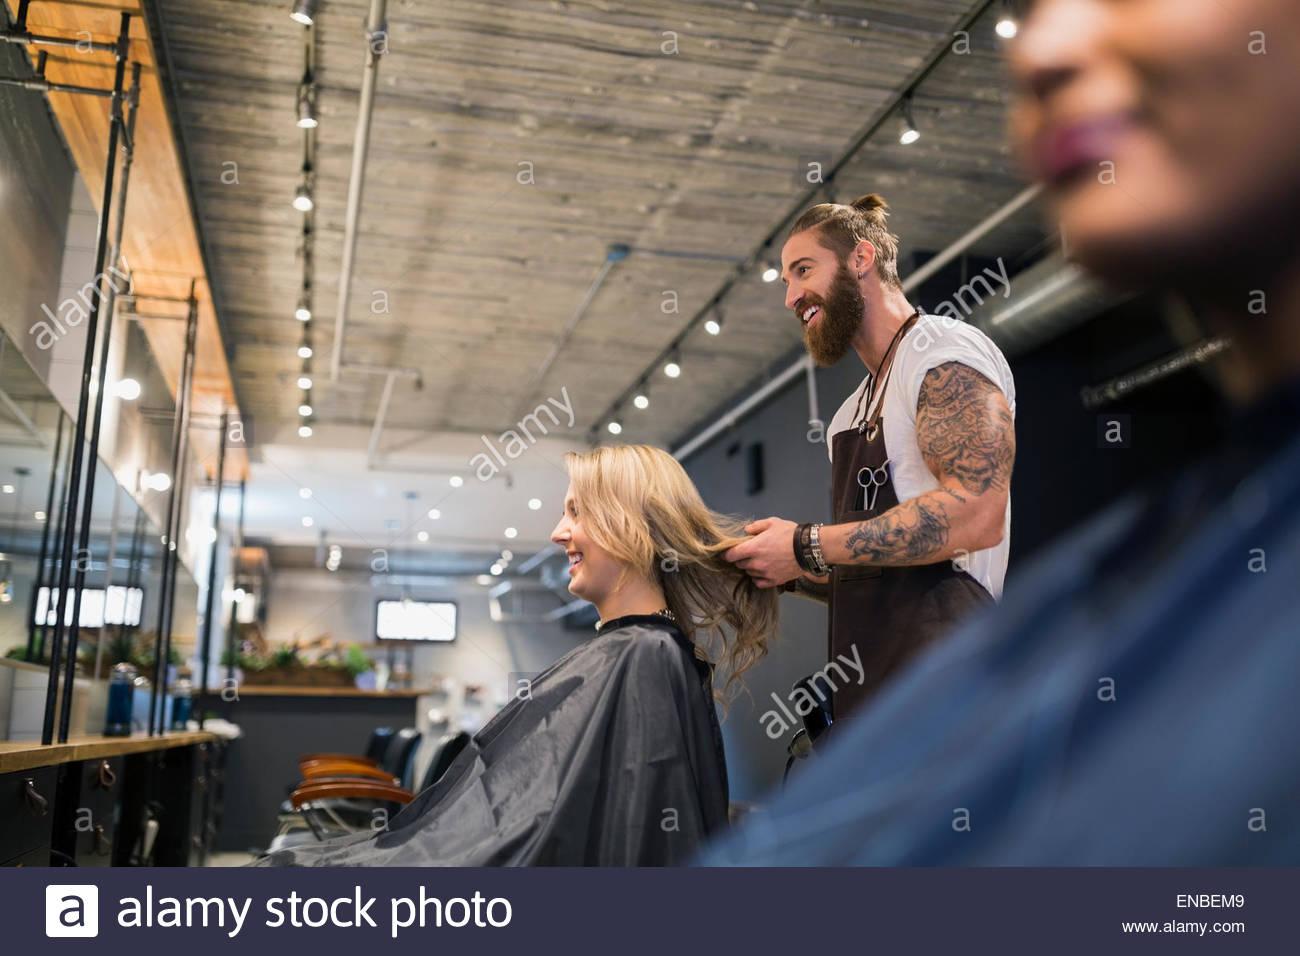 Männliche Friseur Haar-Styling Womans im Friseursalon Stockbild